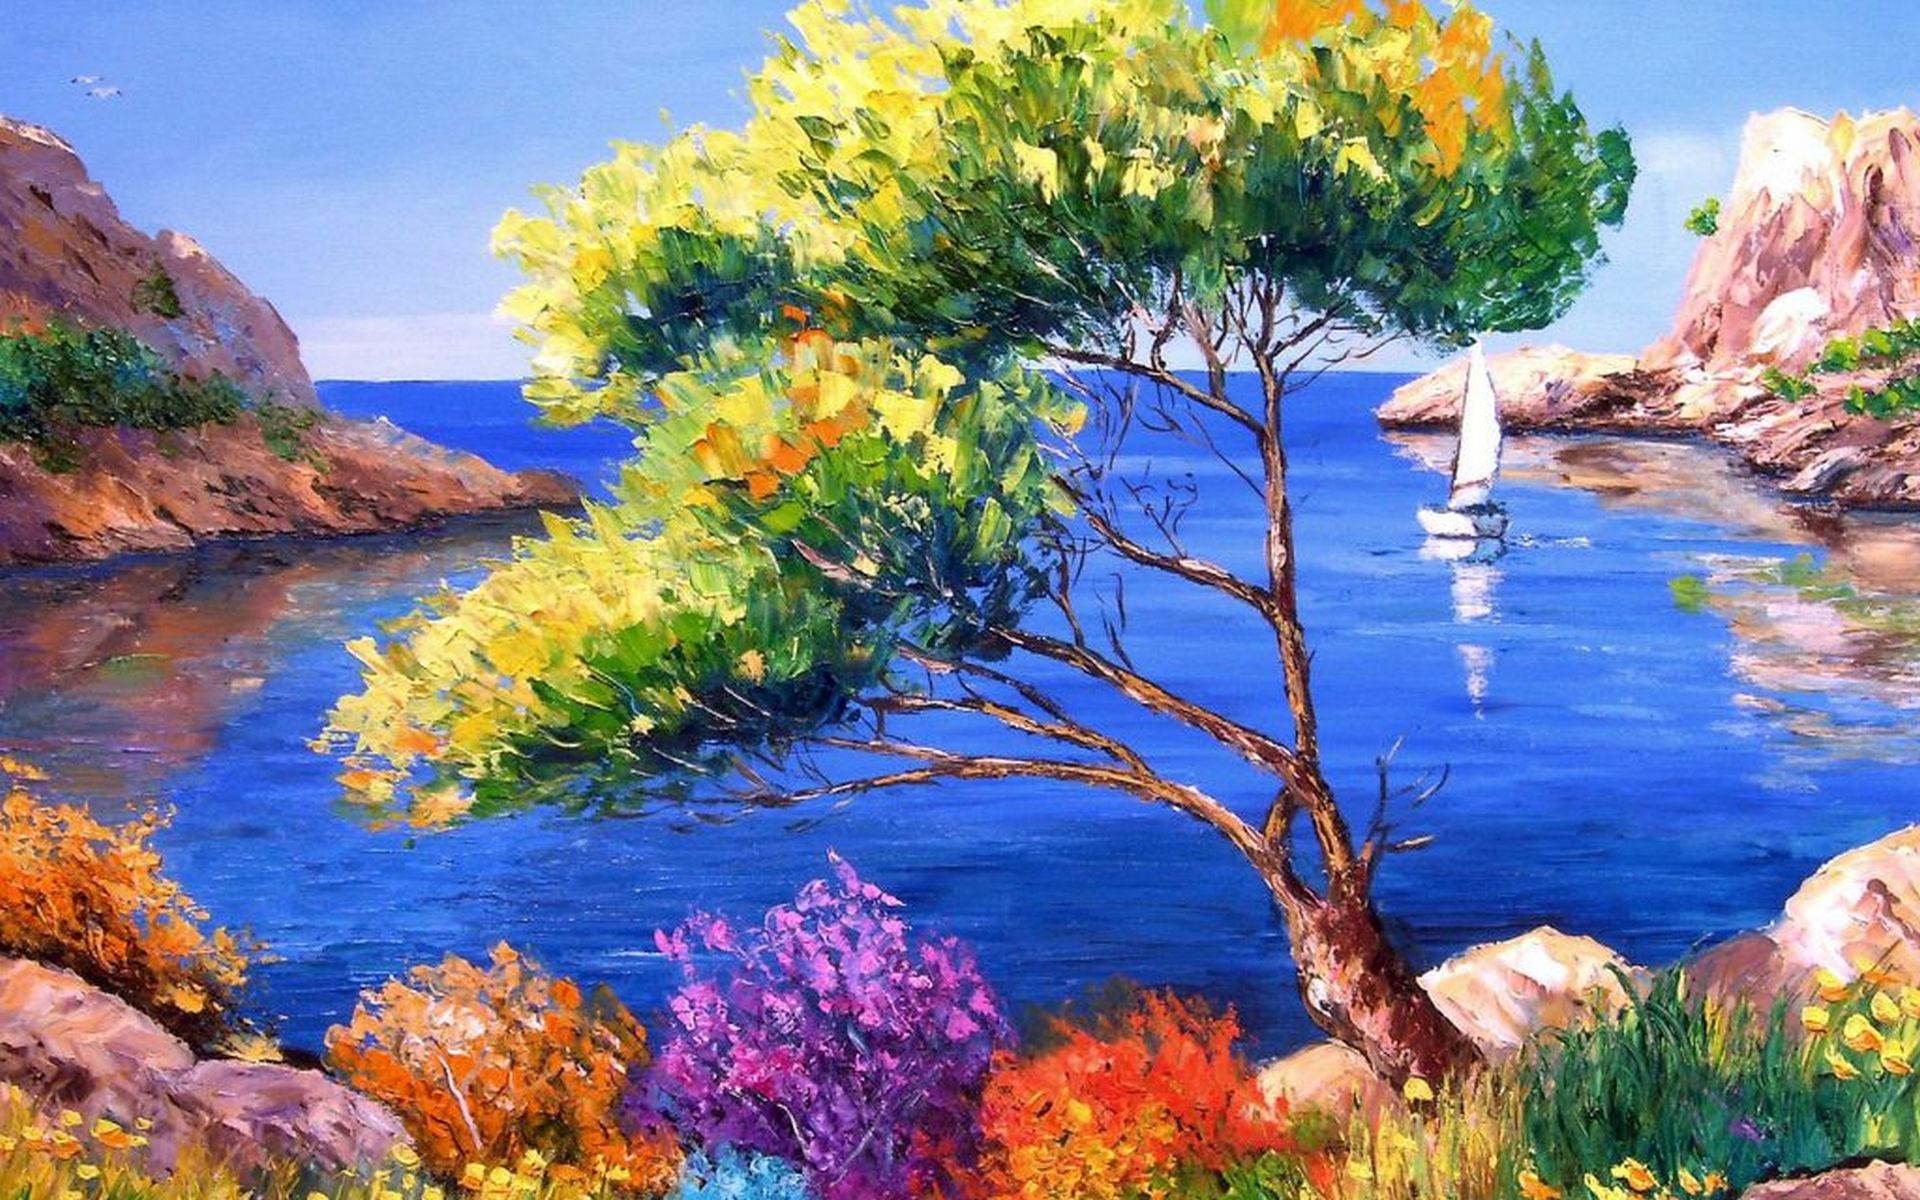 Рисунок, картина, дерево, трава, камни ...: fonwall.ru/wallpaper/risunok-kartina-derevo-trava.html